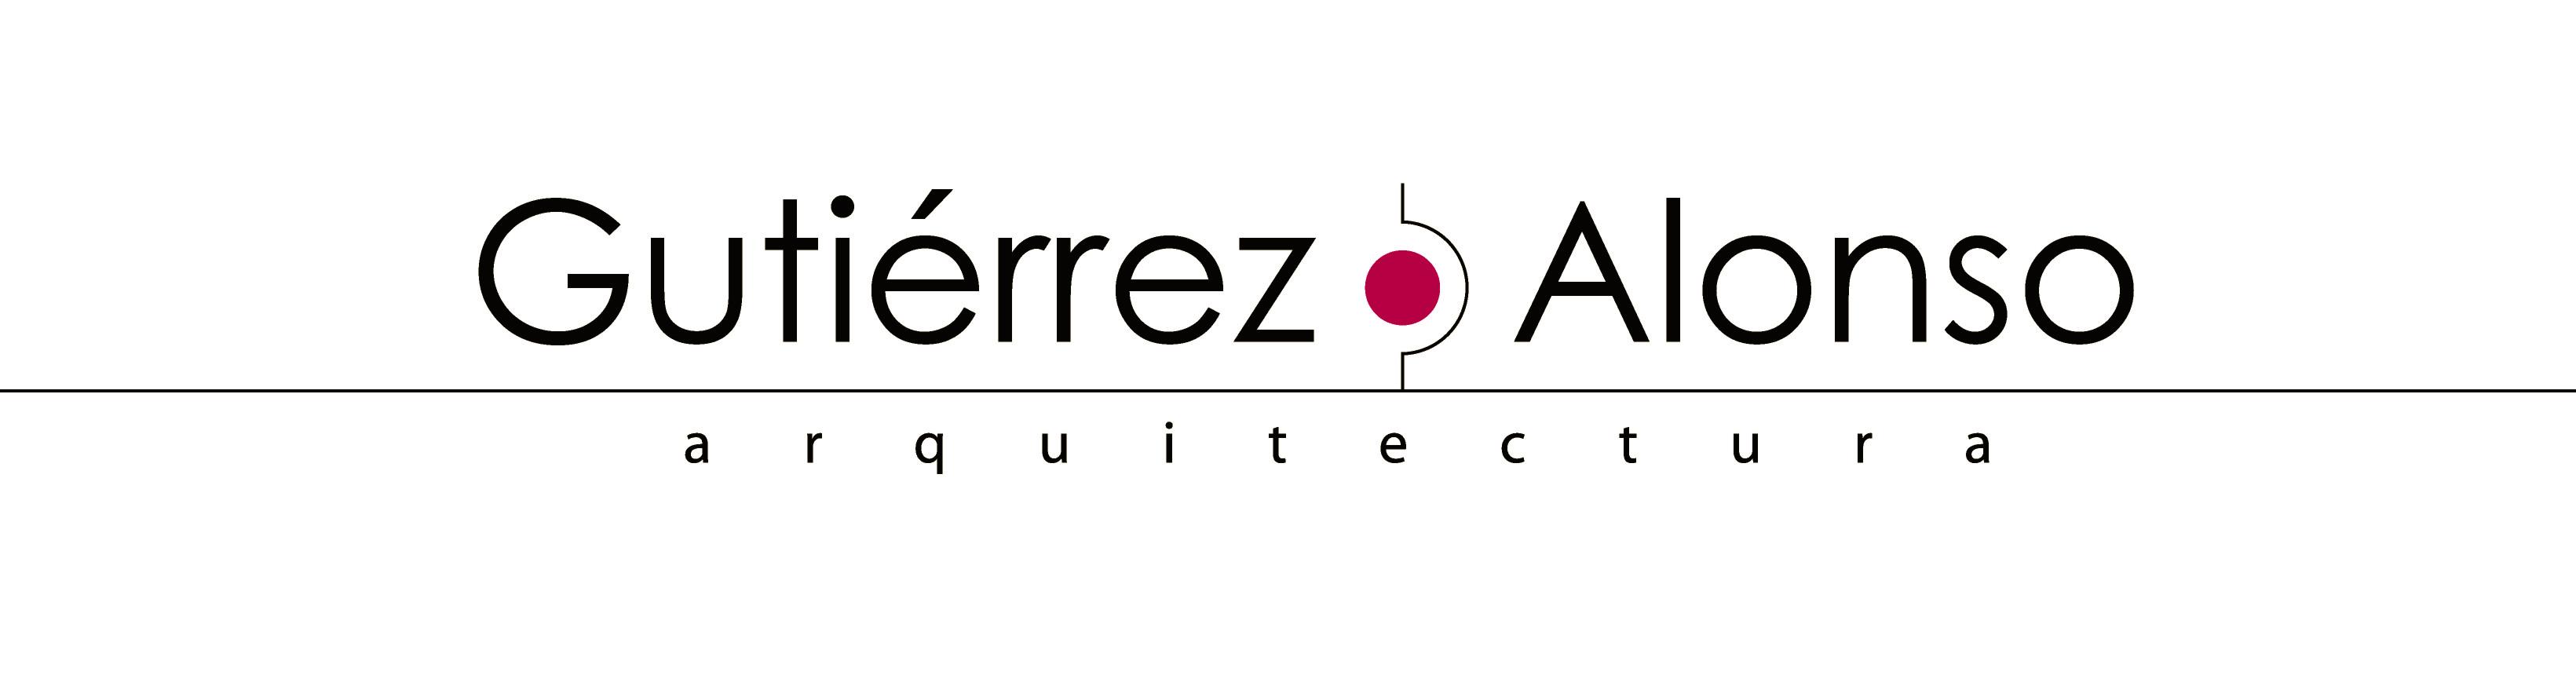 Arquitectos Gutierrez-alonso